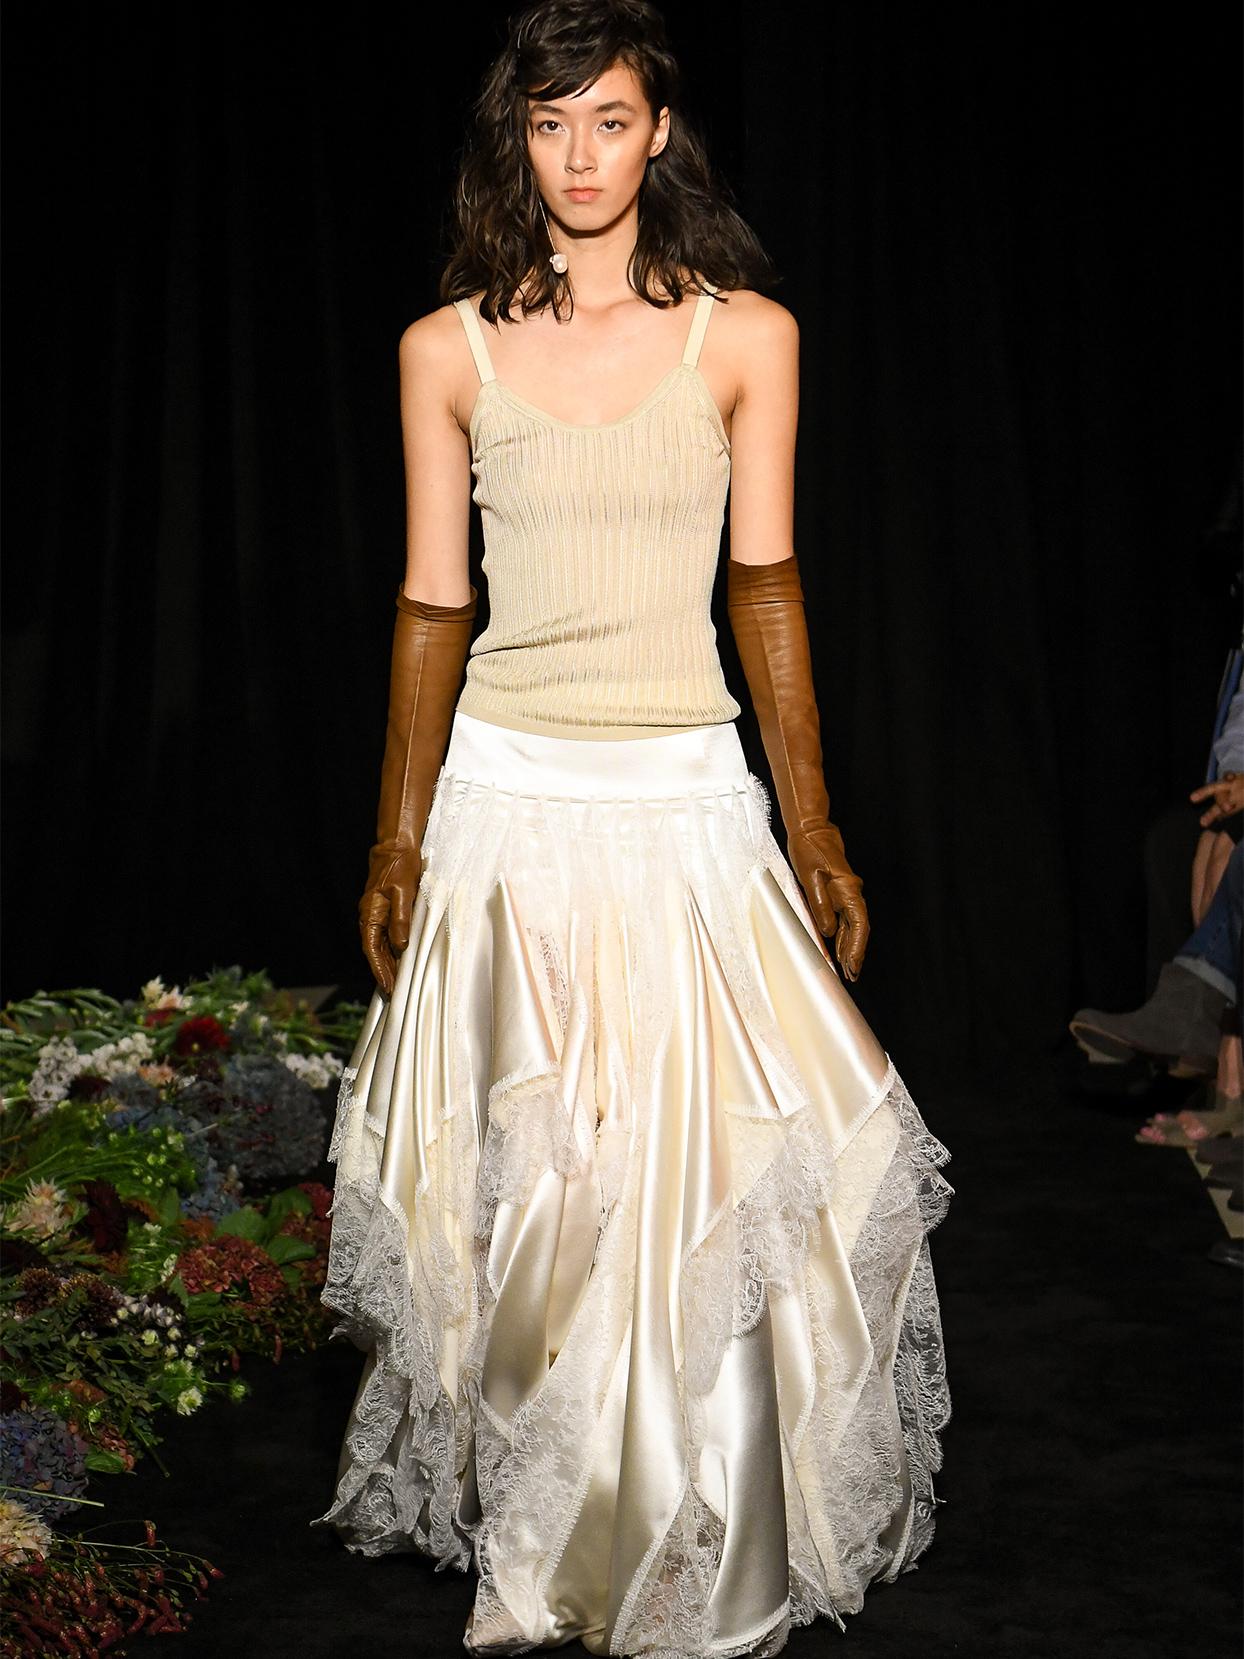 danielle frankel tank top ruffle skirt wedding dress fall 2020